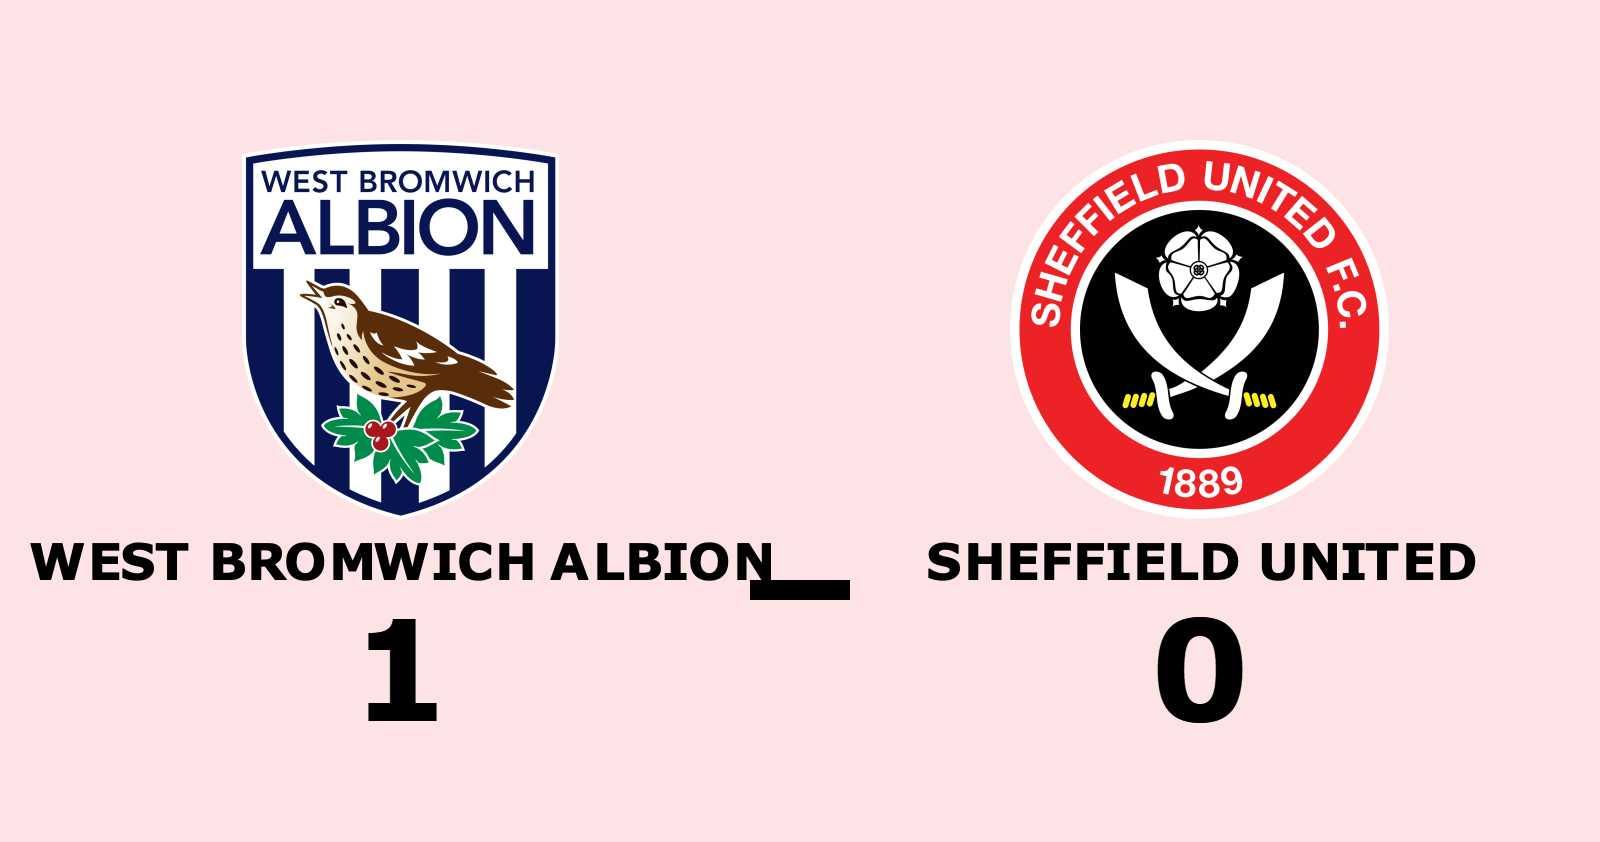 Conor Gallagher matchhjälte för West Bromwich Albion hemma mot Sheffield United